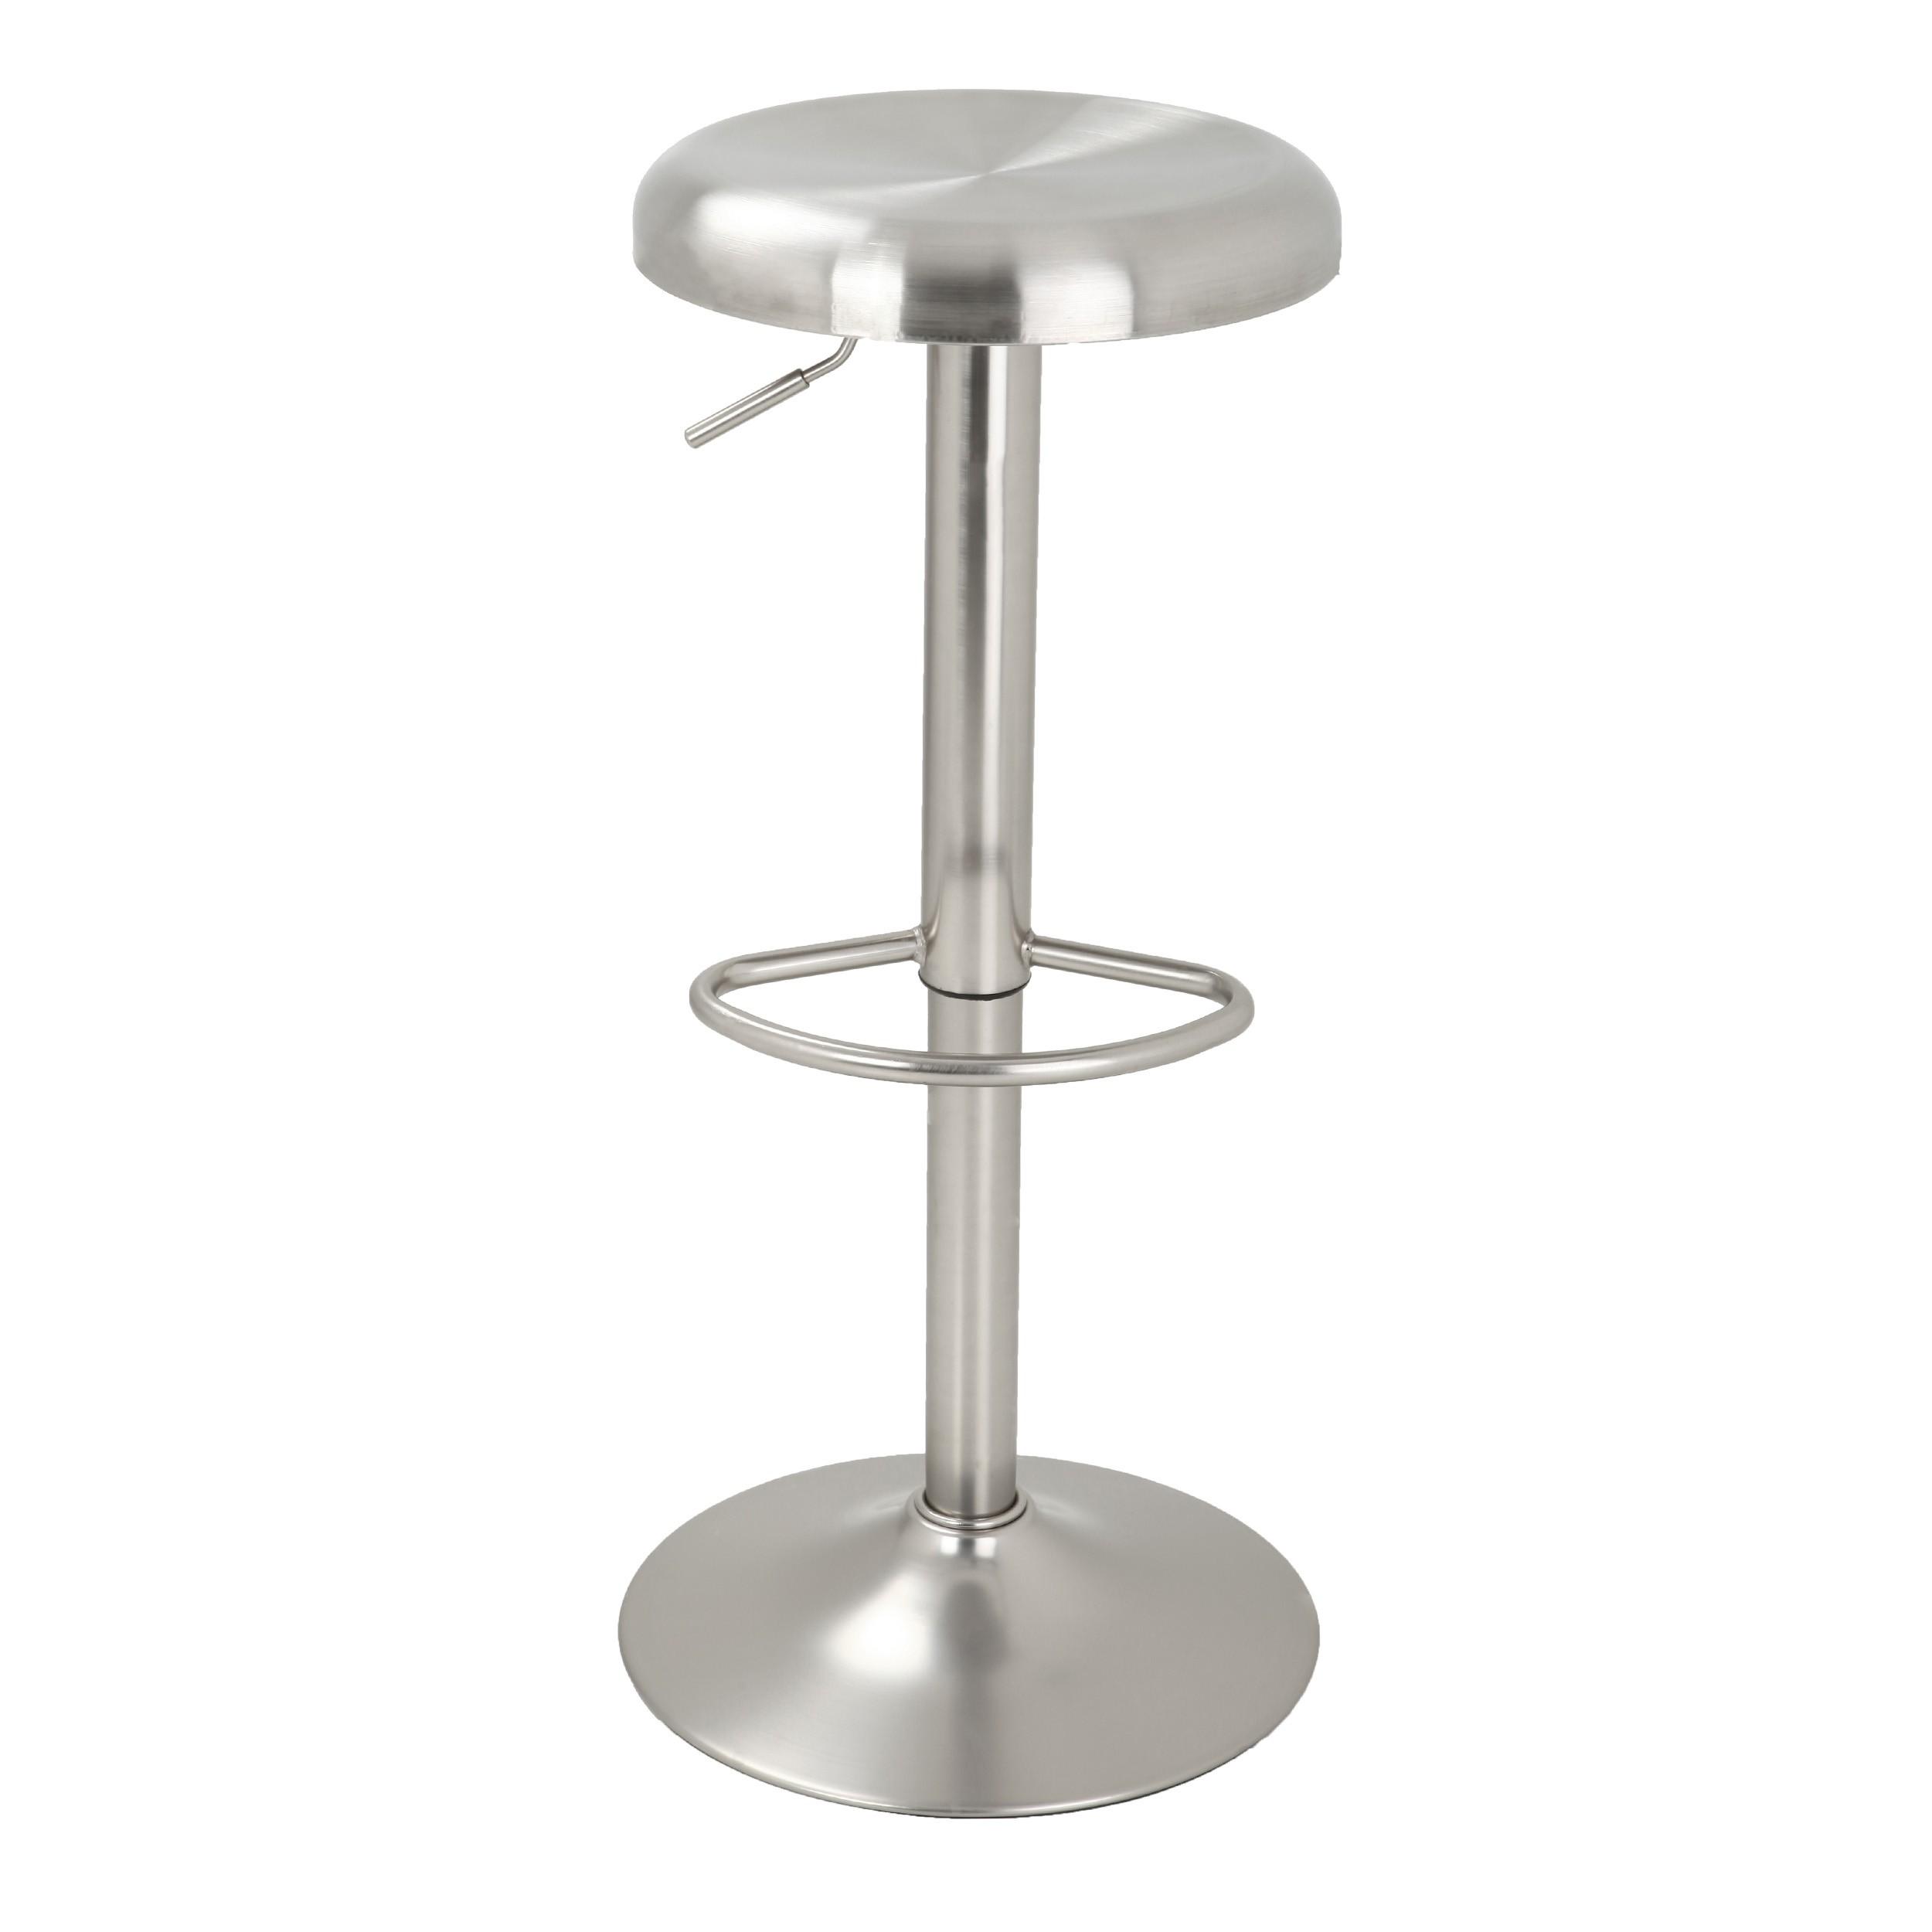 tabouret de bar silver installez nos tabourets de bar silver prix discount rdv d co. Black Bedroom Furniture Sets. Home Design Ideas